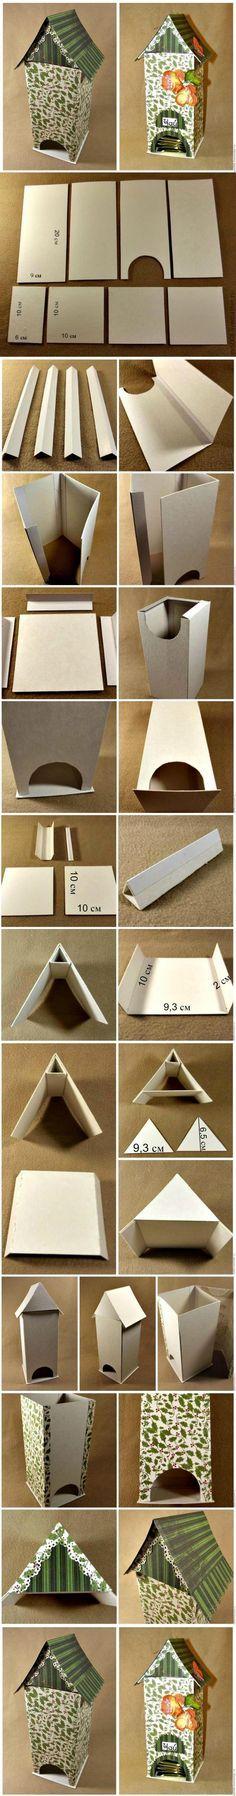 d9d82d844c7 DIY Cardboard Tea Bag Dispenser Caixa De Leite